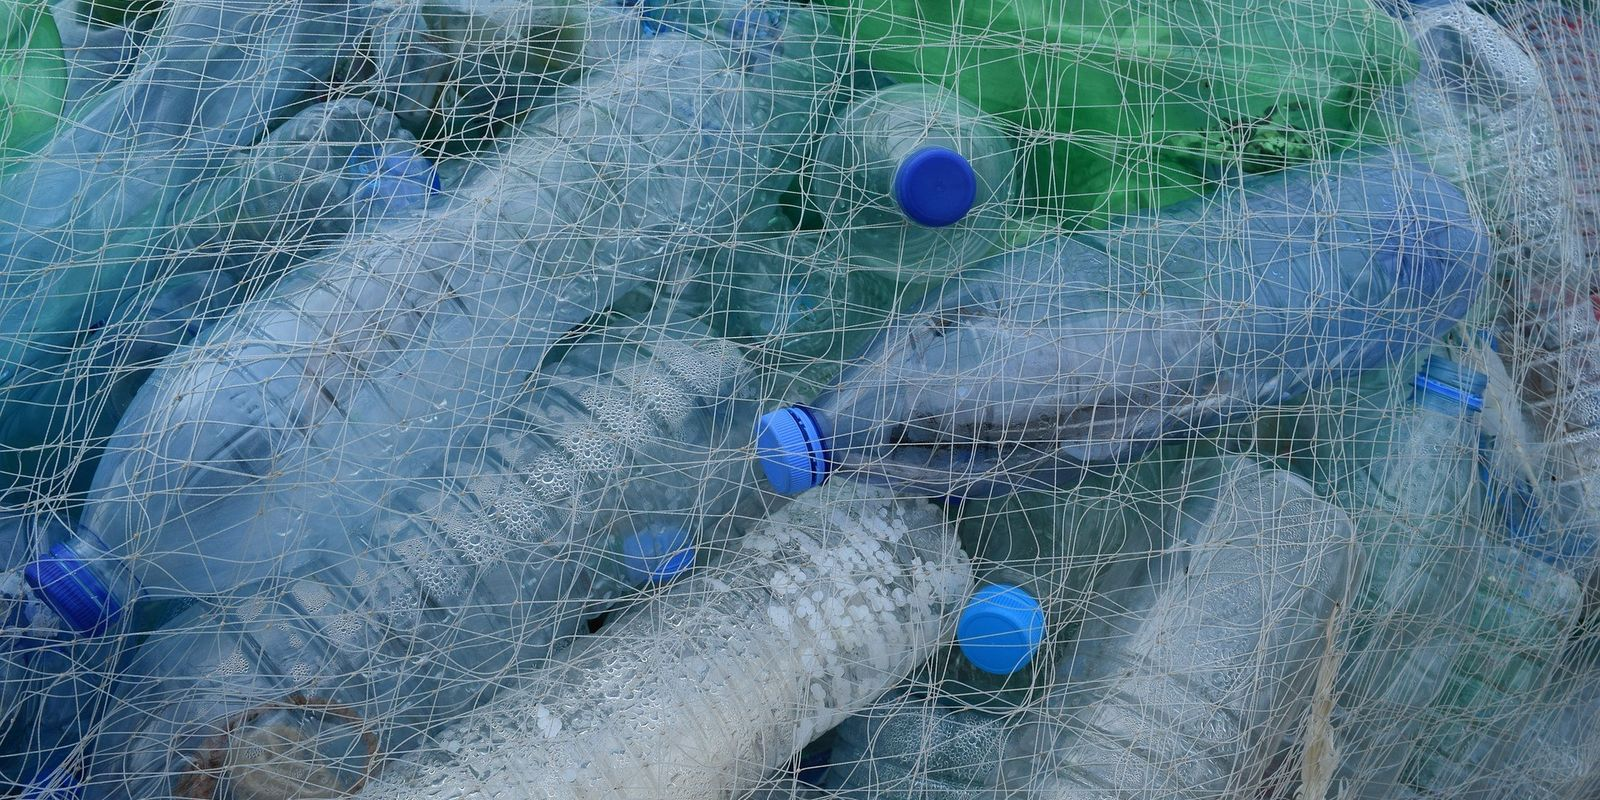 Baleares, libre de plásticos de un solo uso en 2021